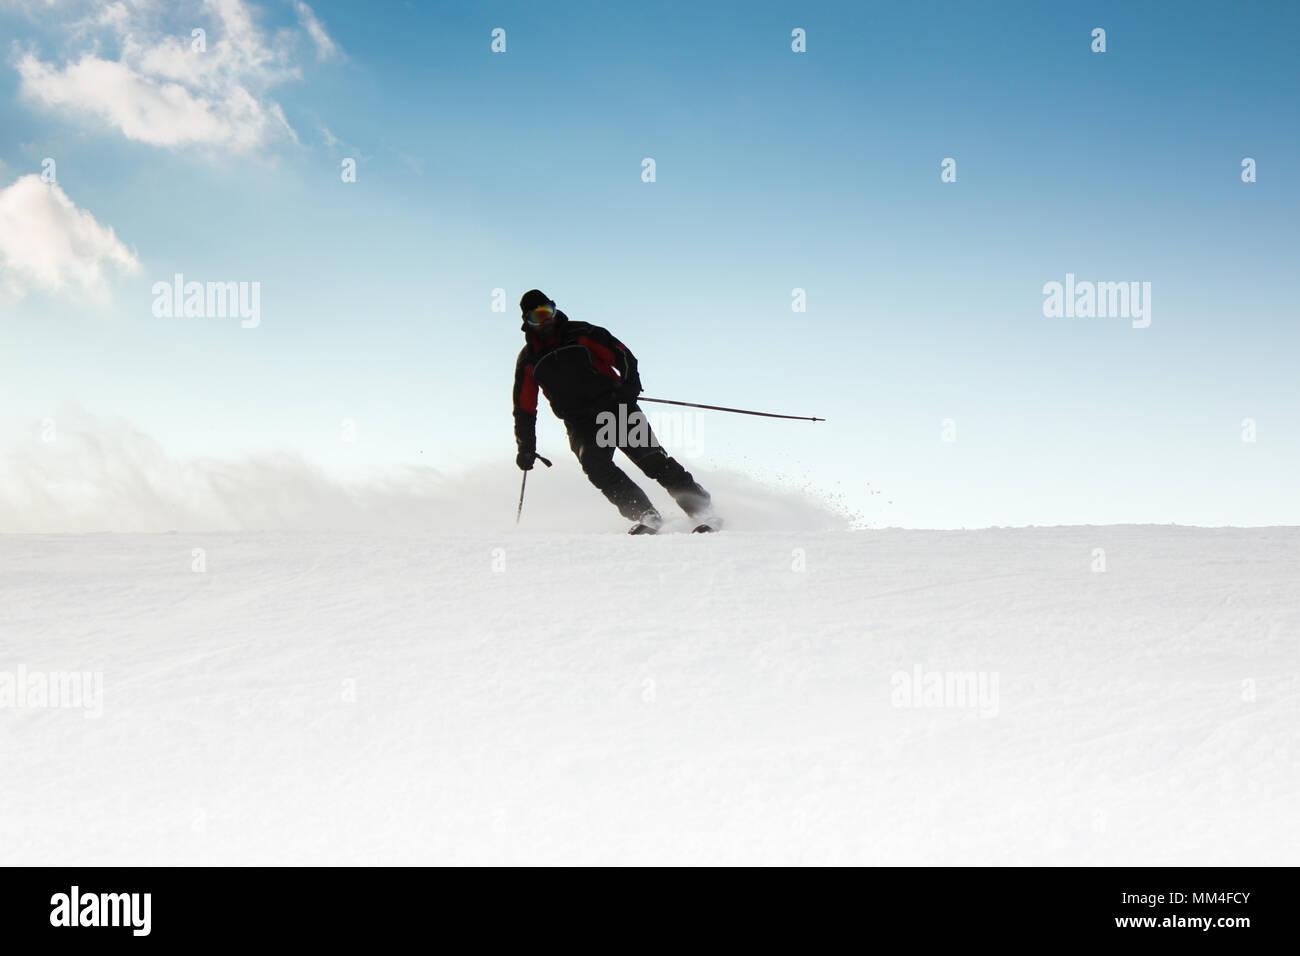 Skier on piste running downhill Stock Photo